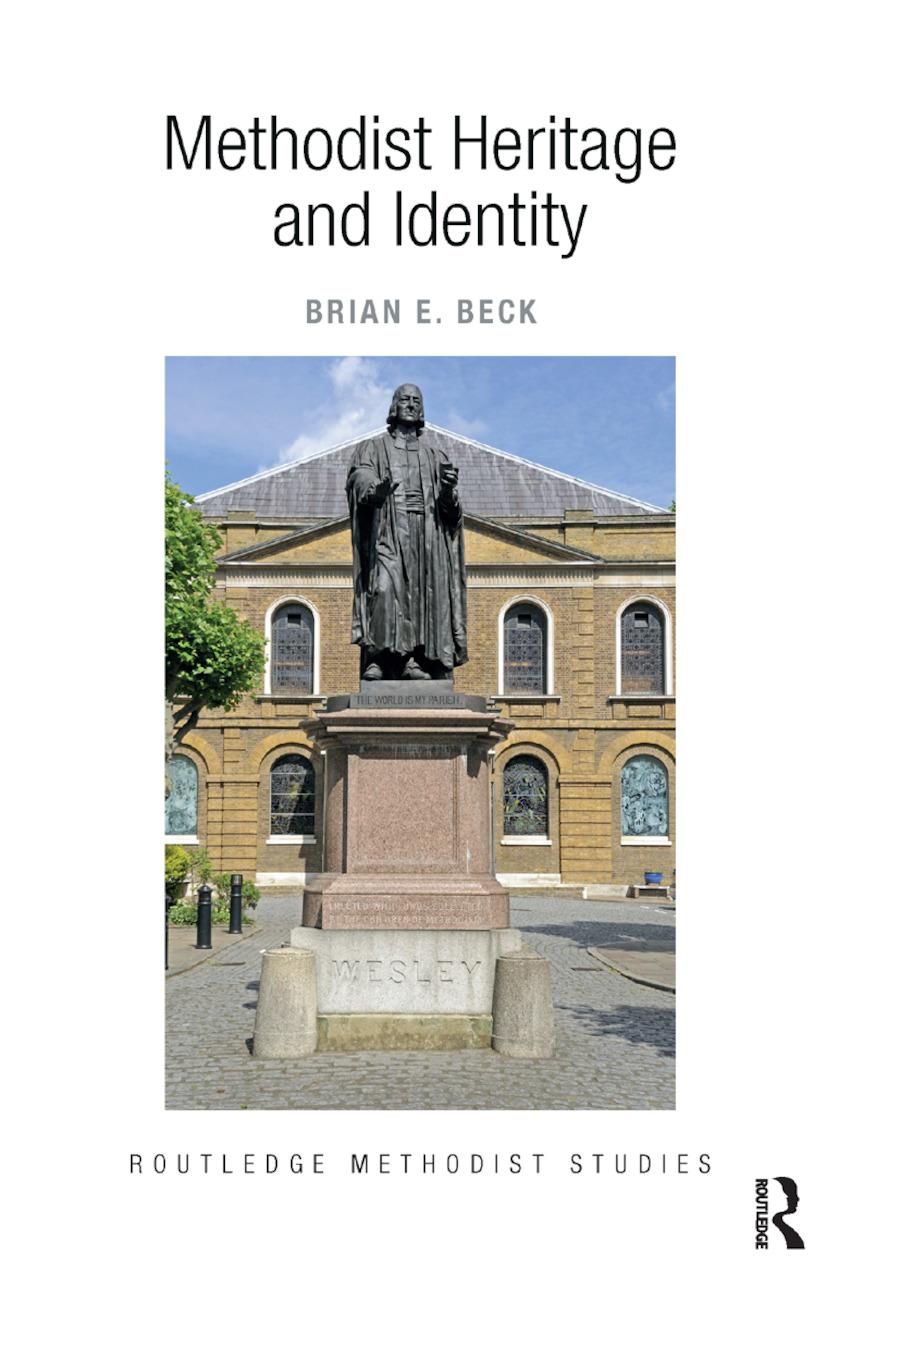 Methodist Heritage and Identity